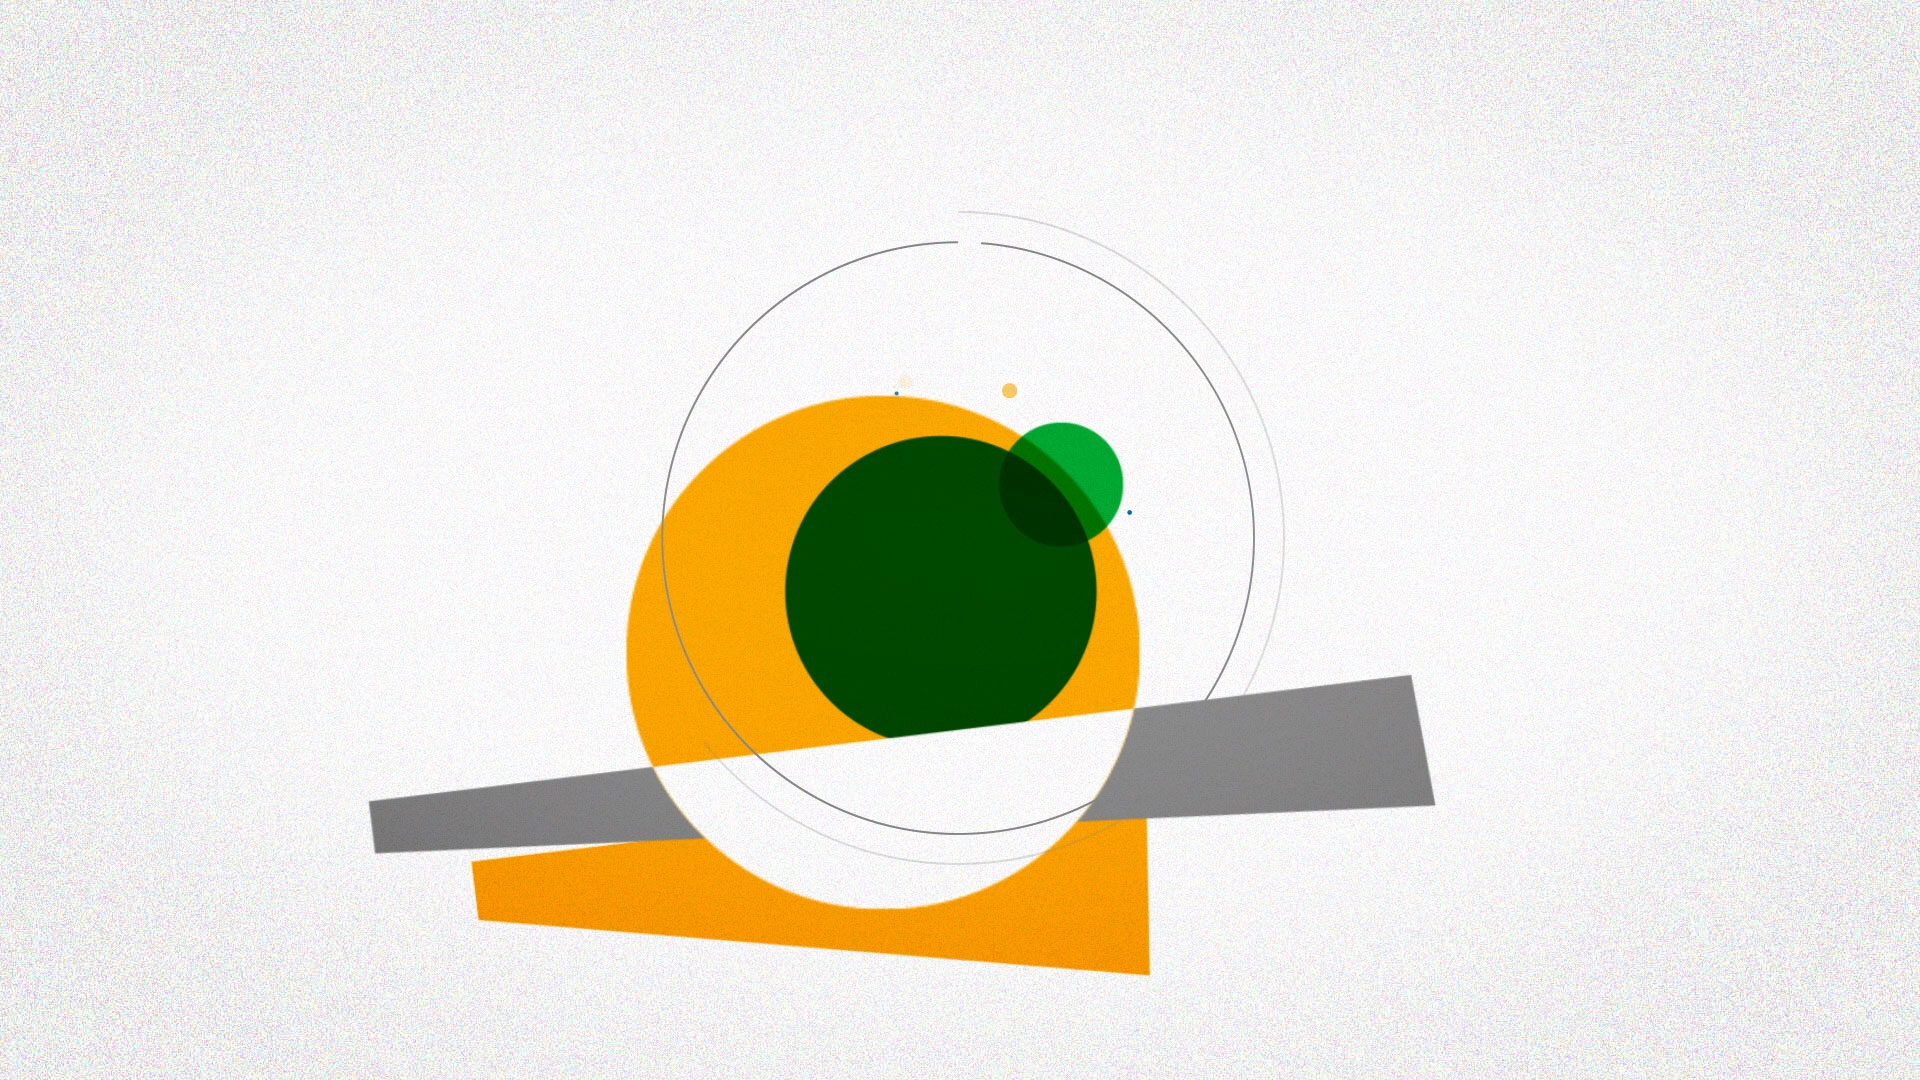 Extended Warranty - Service explainer video image